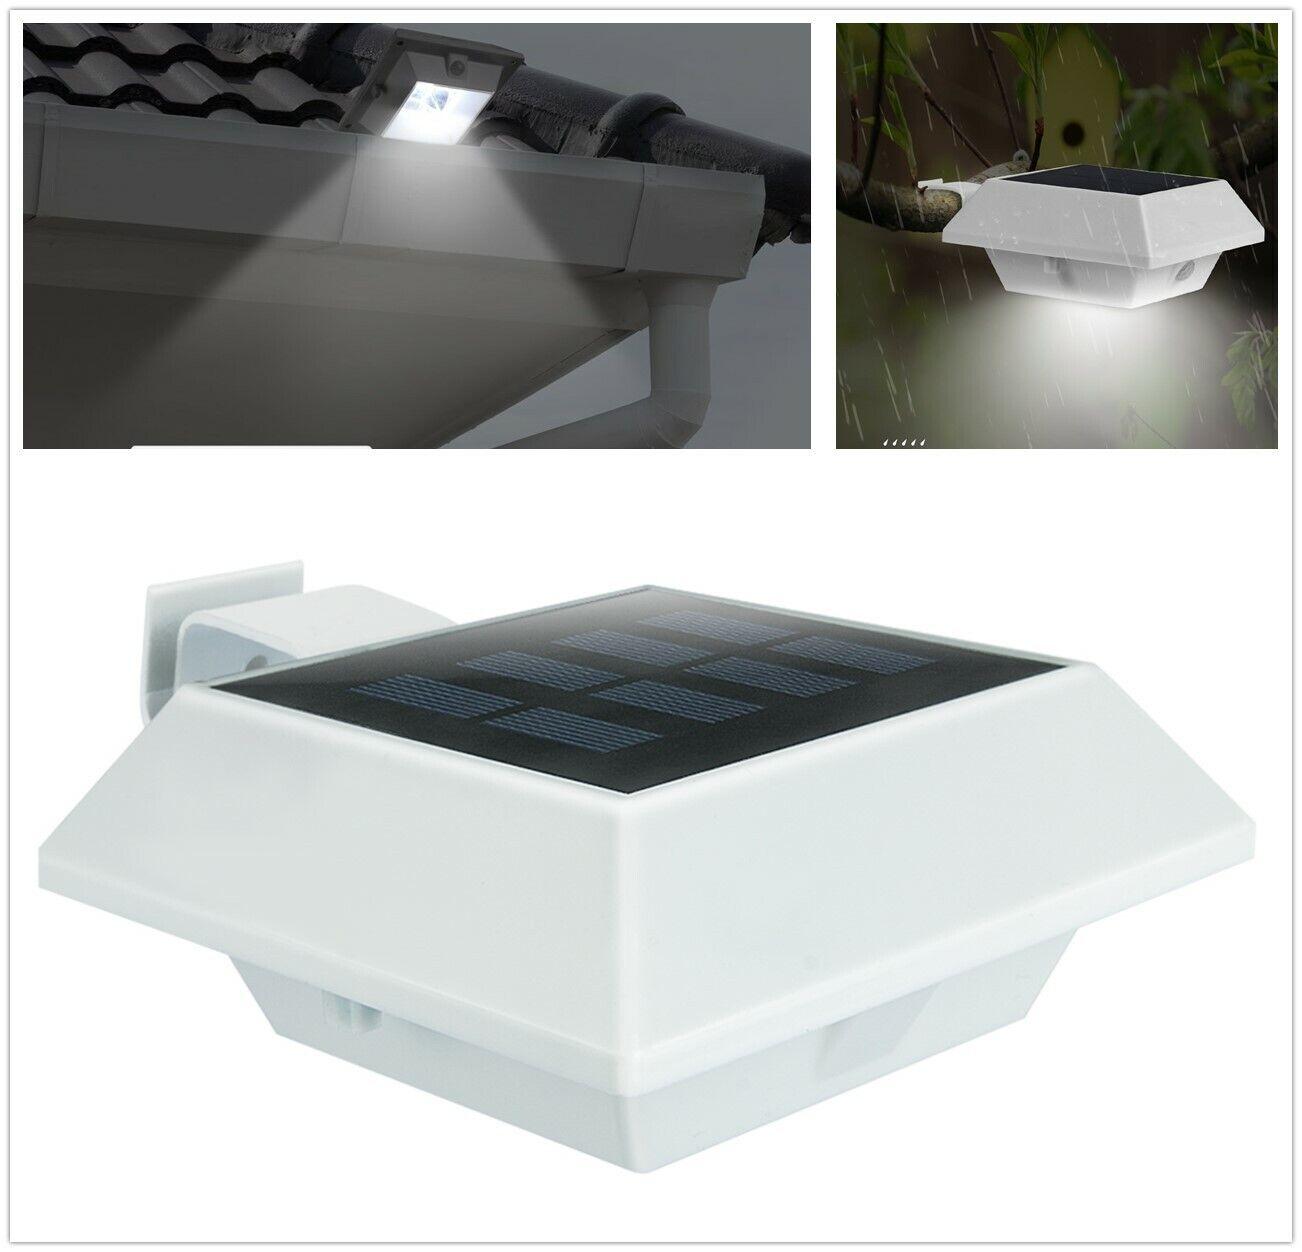 Solar Lampe Solarleuchte Wandlampe Wandleuchte 2 LED Garten Strahler Zaunlicht